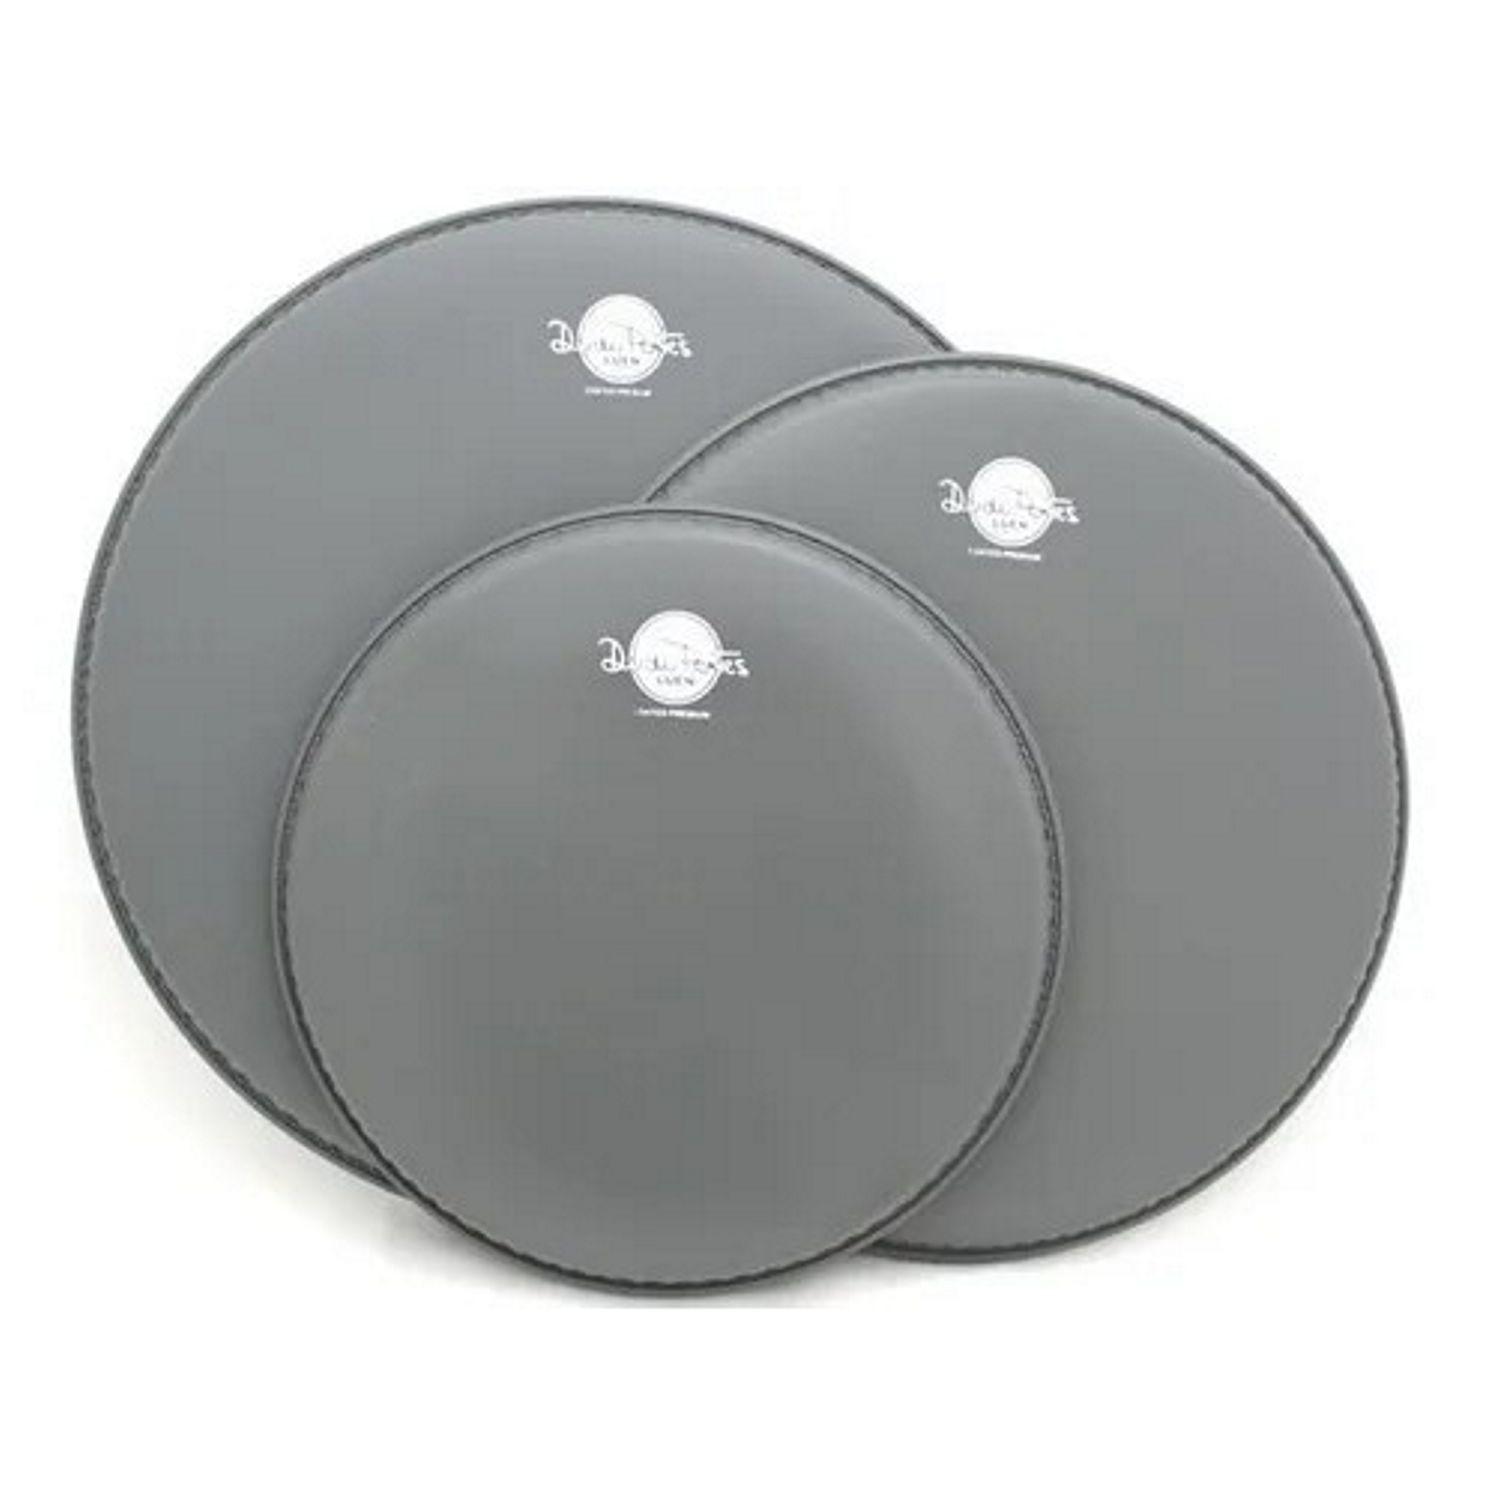 Jogo de Pele de Bateria - 10 - 12 - 14 - Coated Premium - Dudu Portes - Porosa - Luen